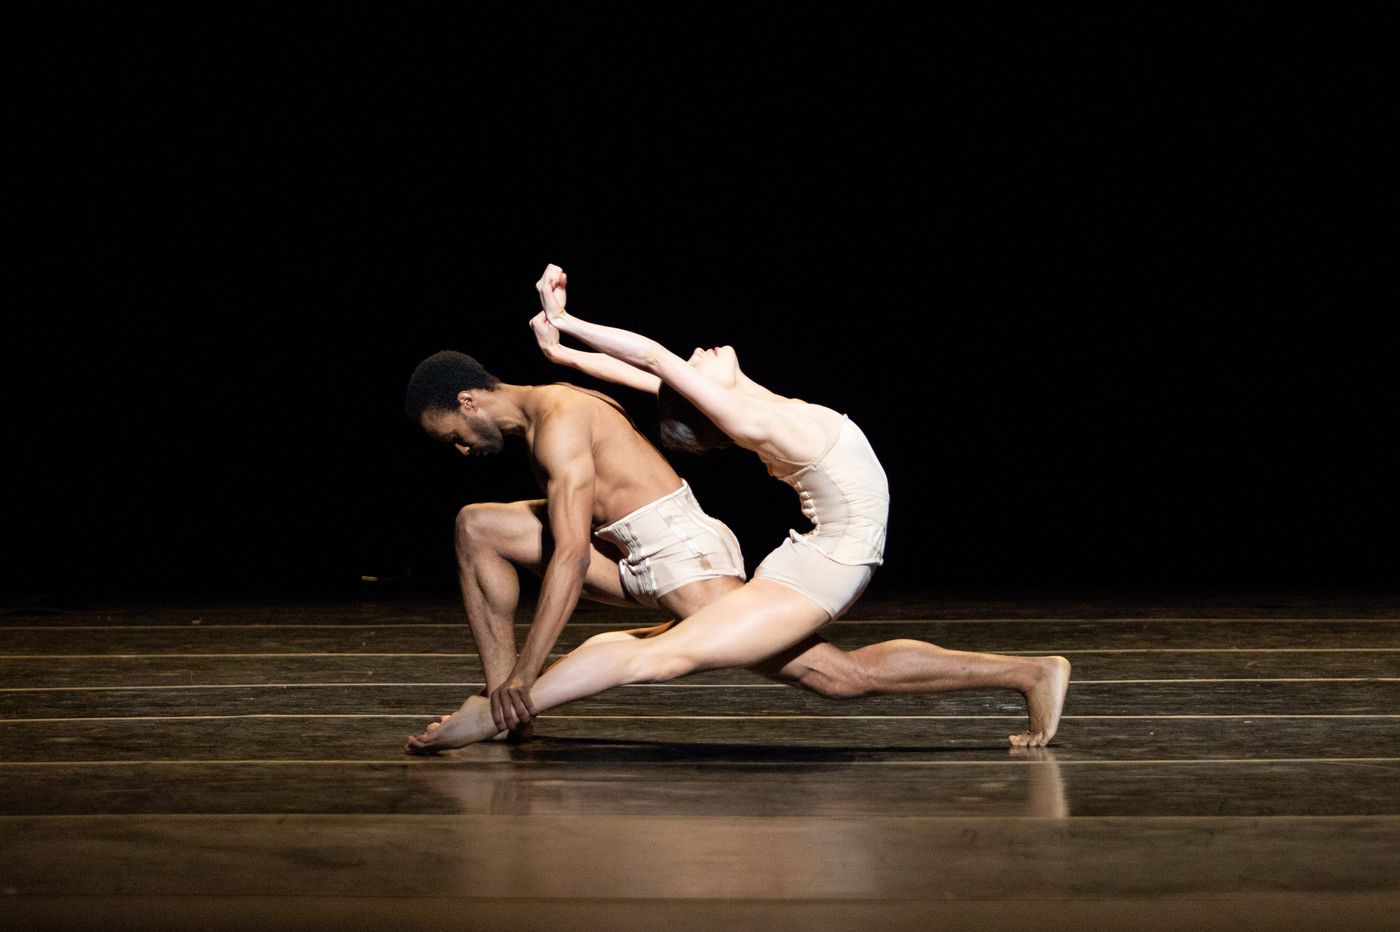 Pennsylvania Ballet 'Petite Mort' program puts the company's distinct mark on modern